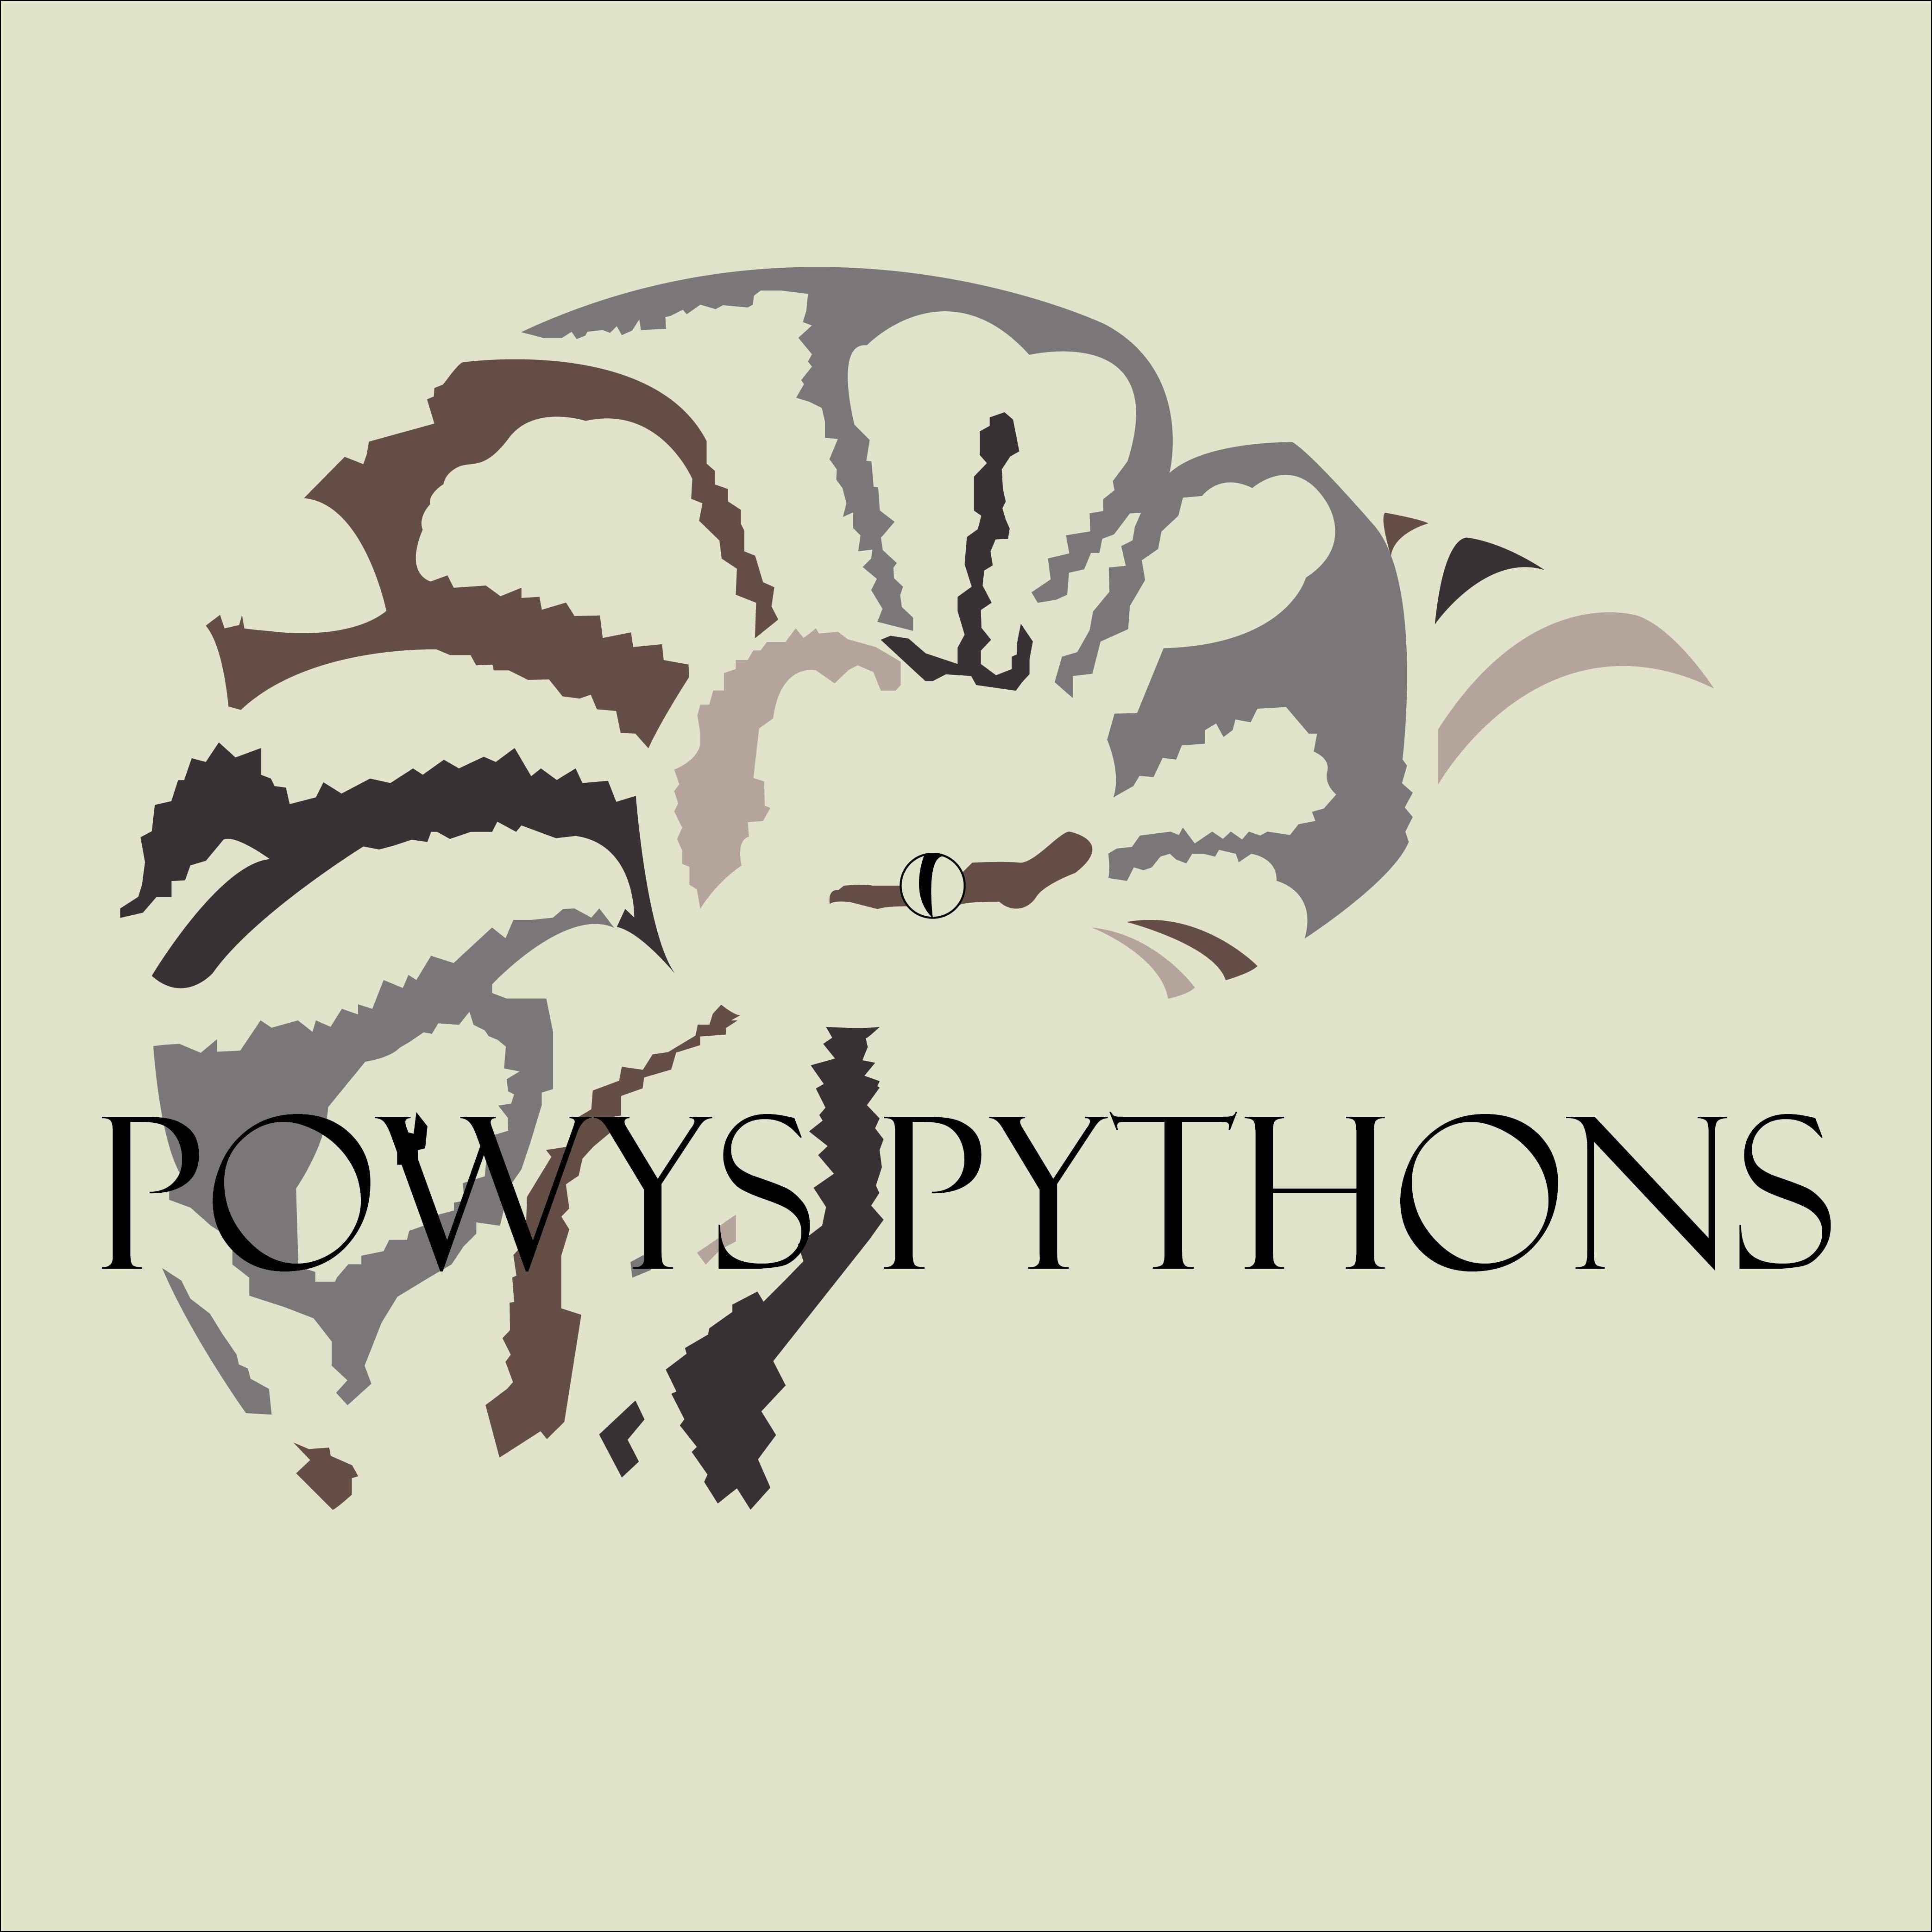 © Powys Pythons